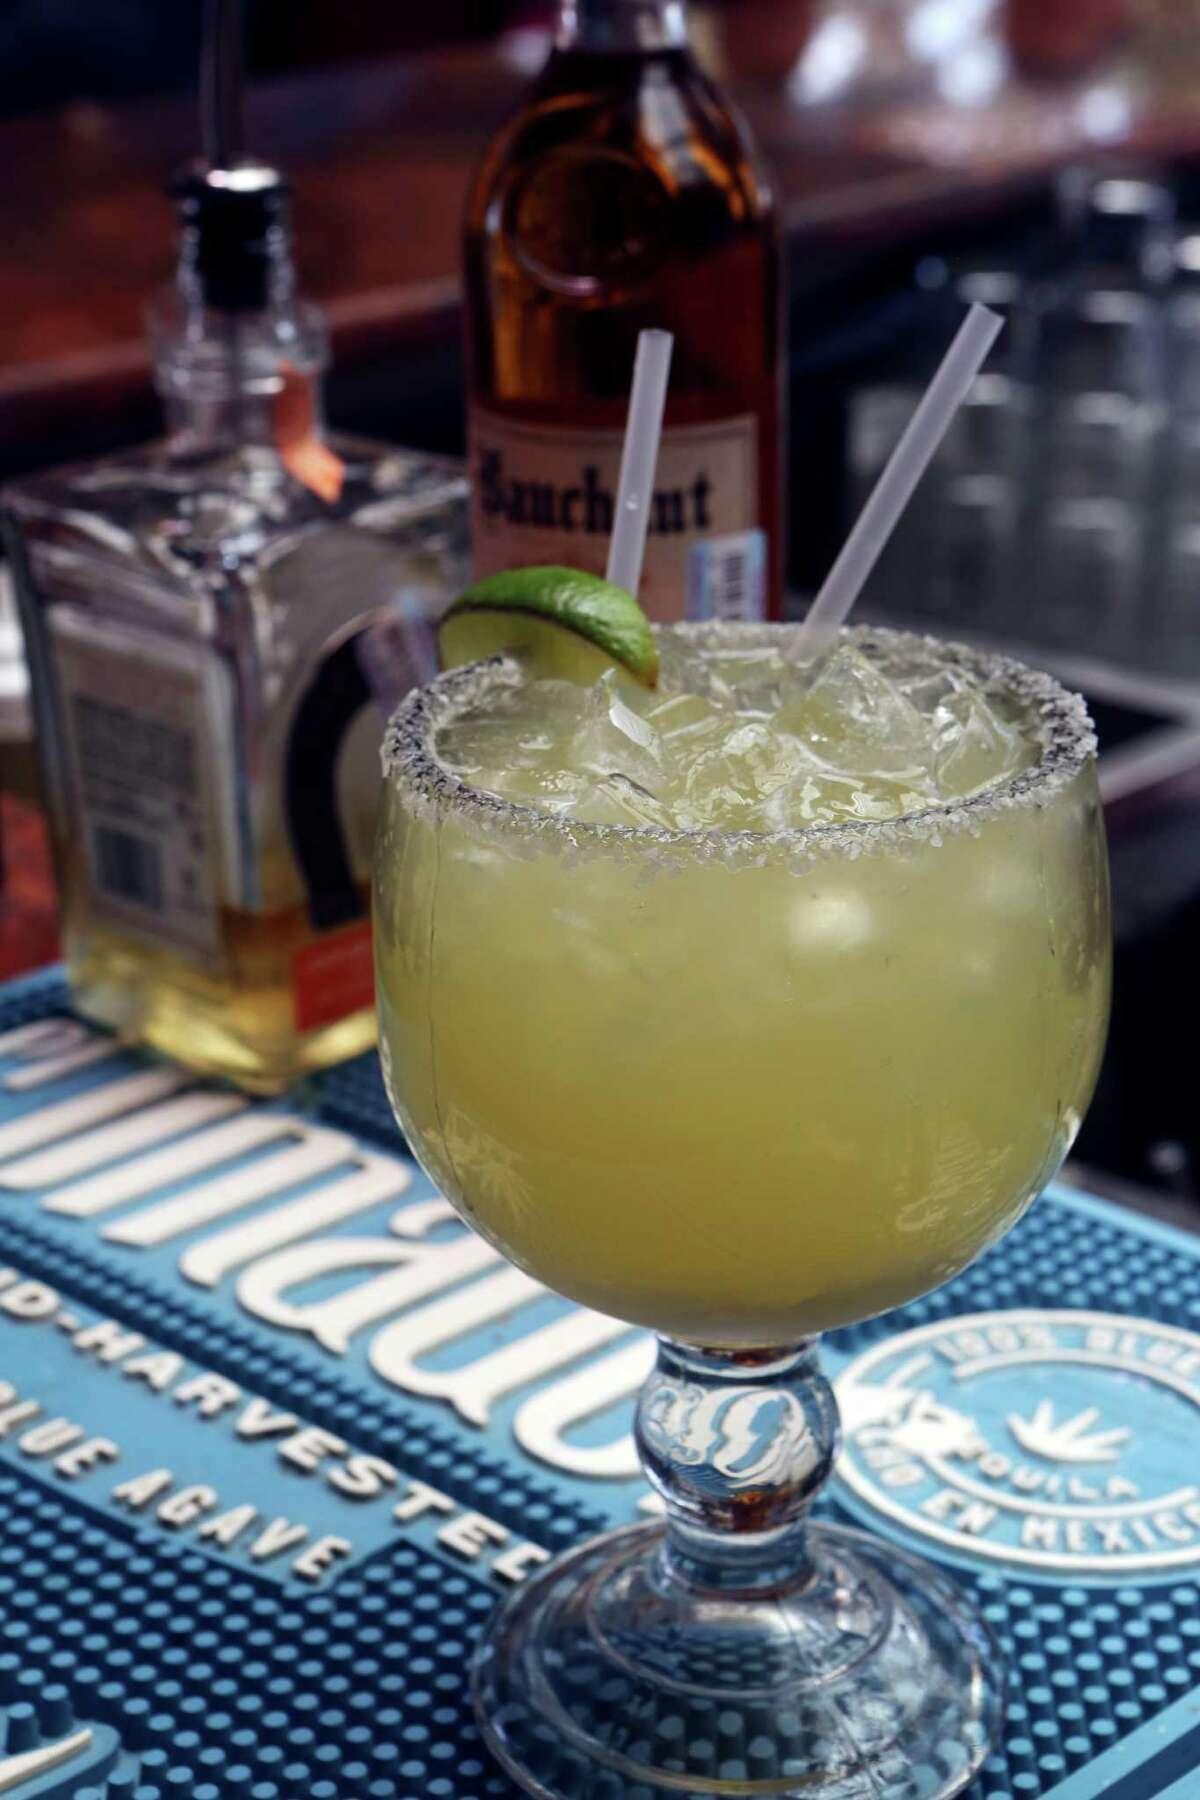 The margarita at La Tequilera del Patrón includes lime juice, orange juice, agave nectar, tequila, and orange liqueur.